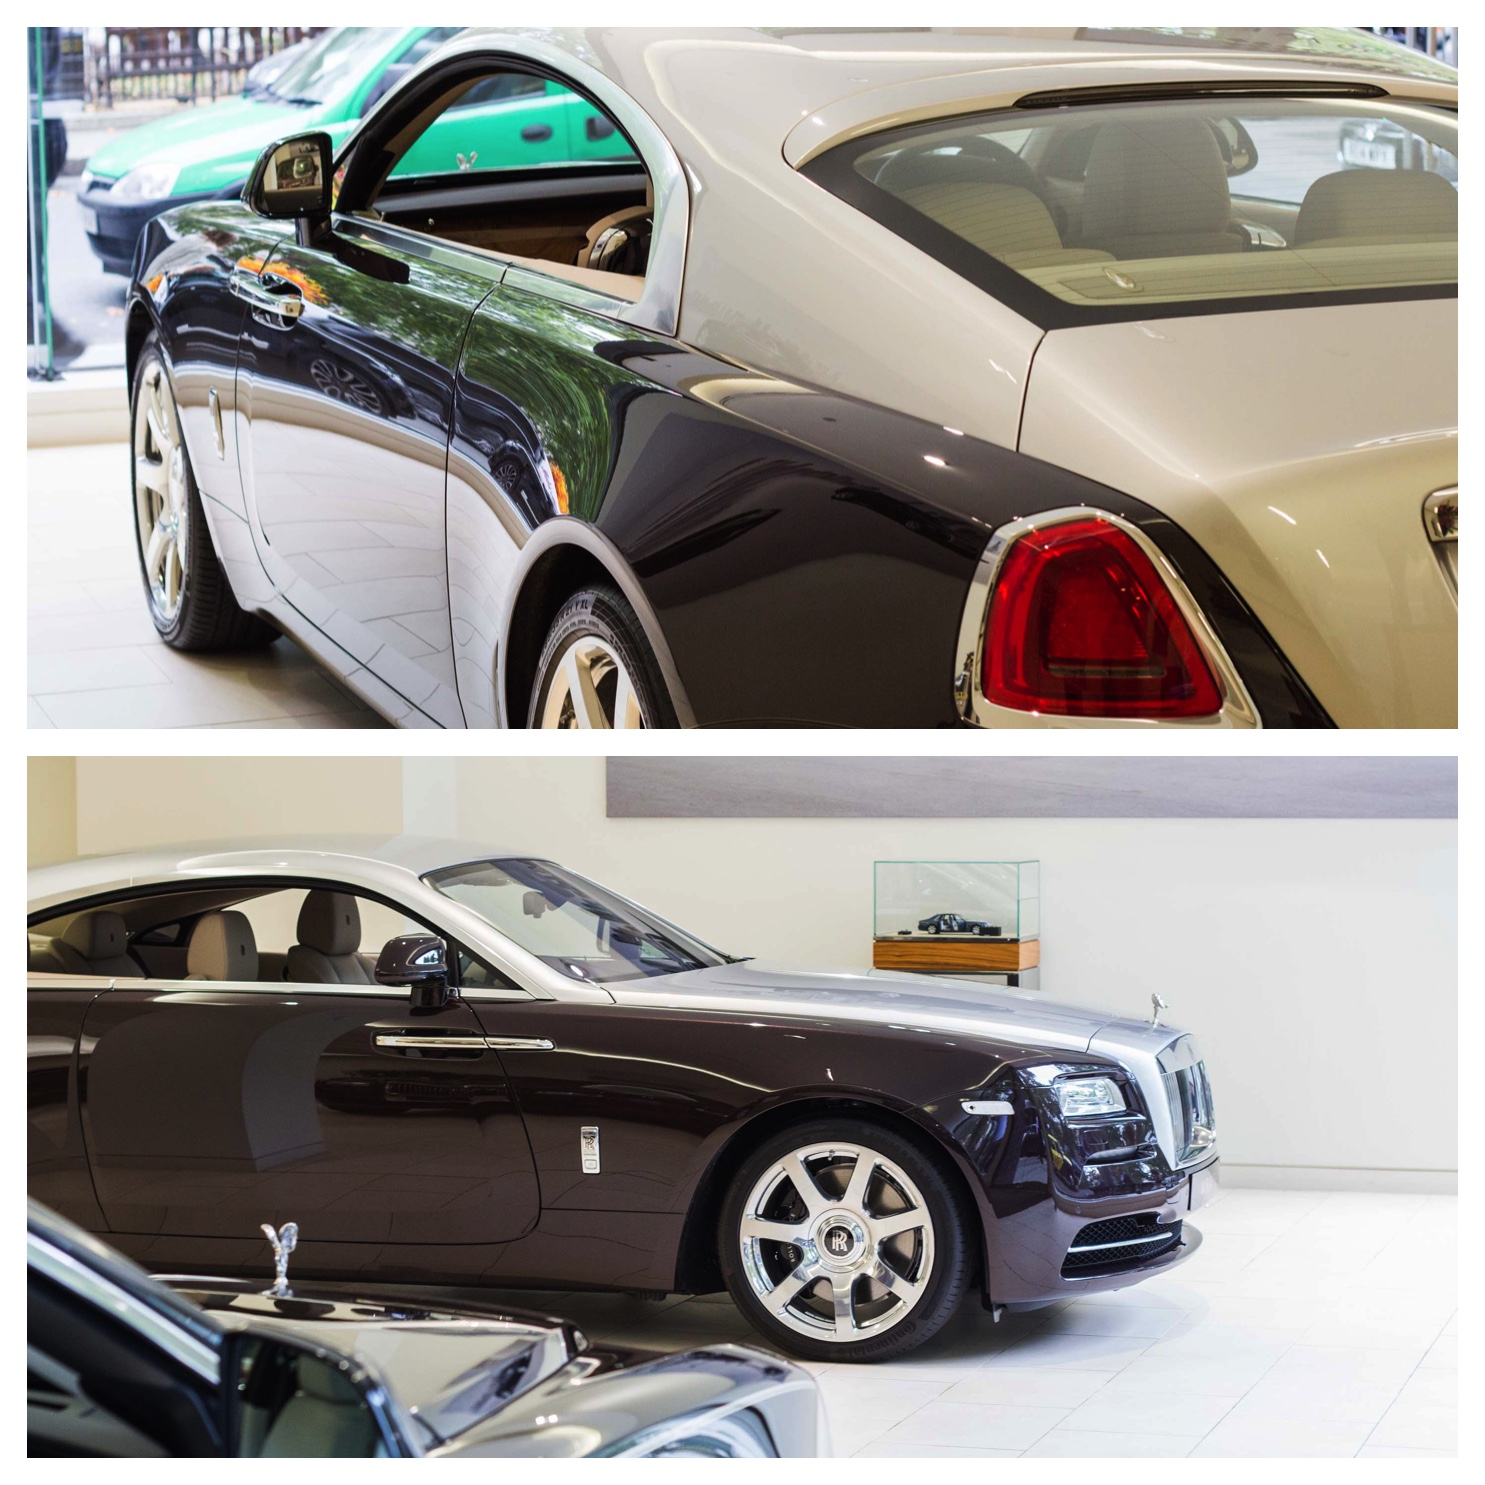 The Most Powerful Rolls-Royce Ever Built, Wraith